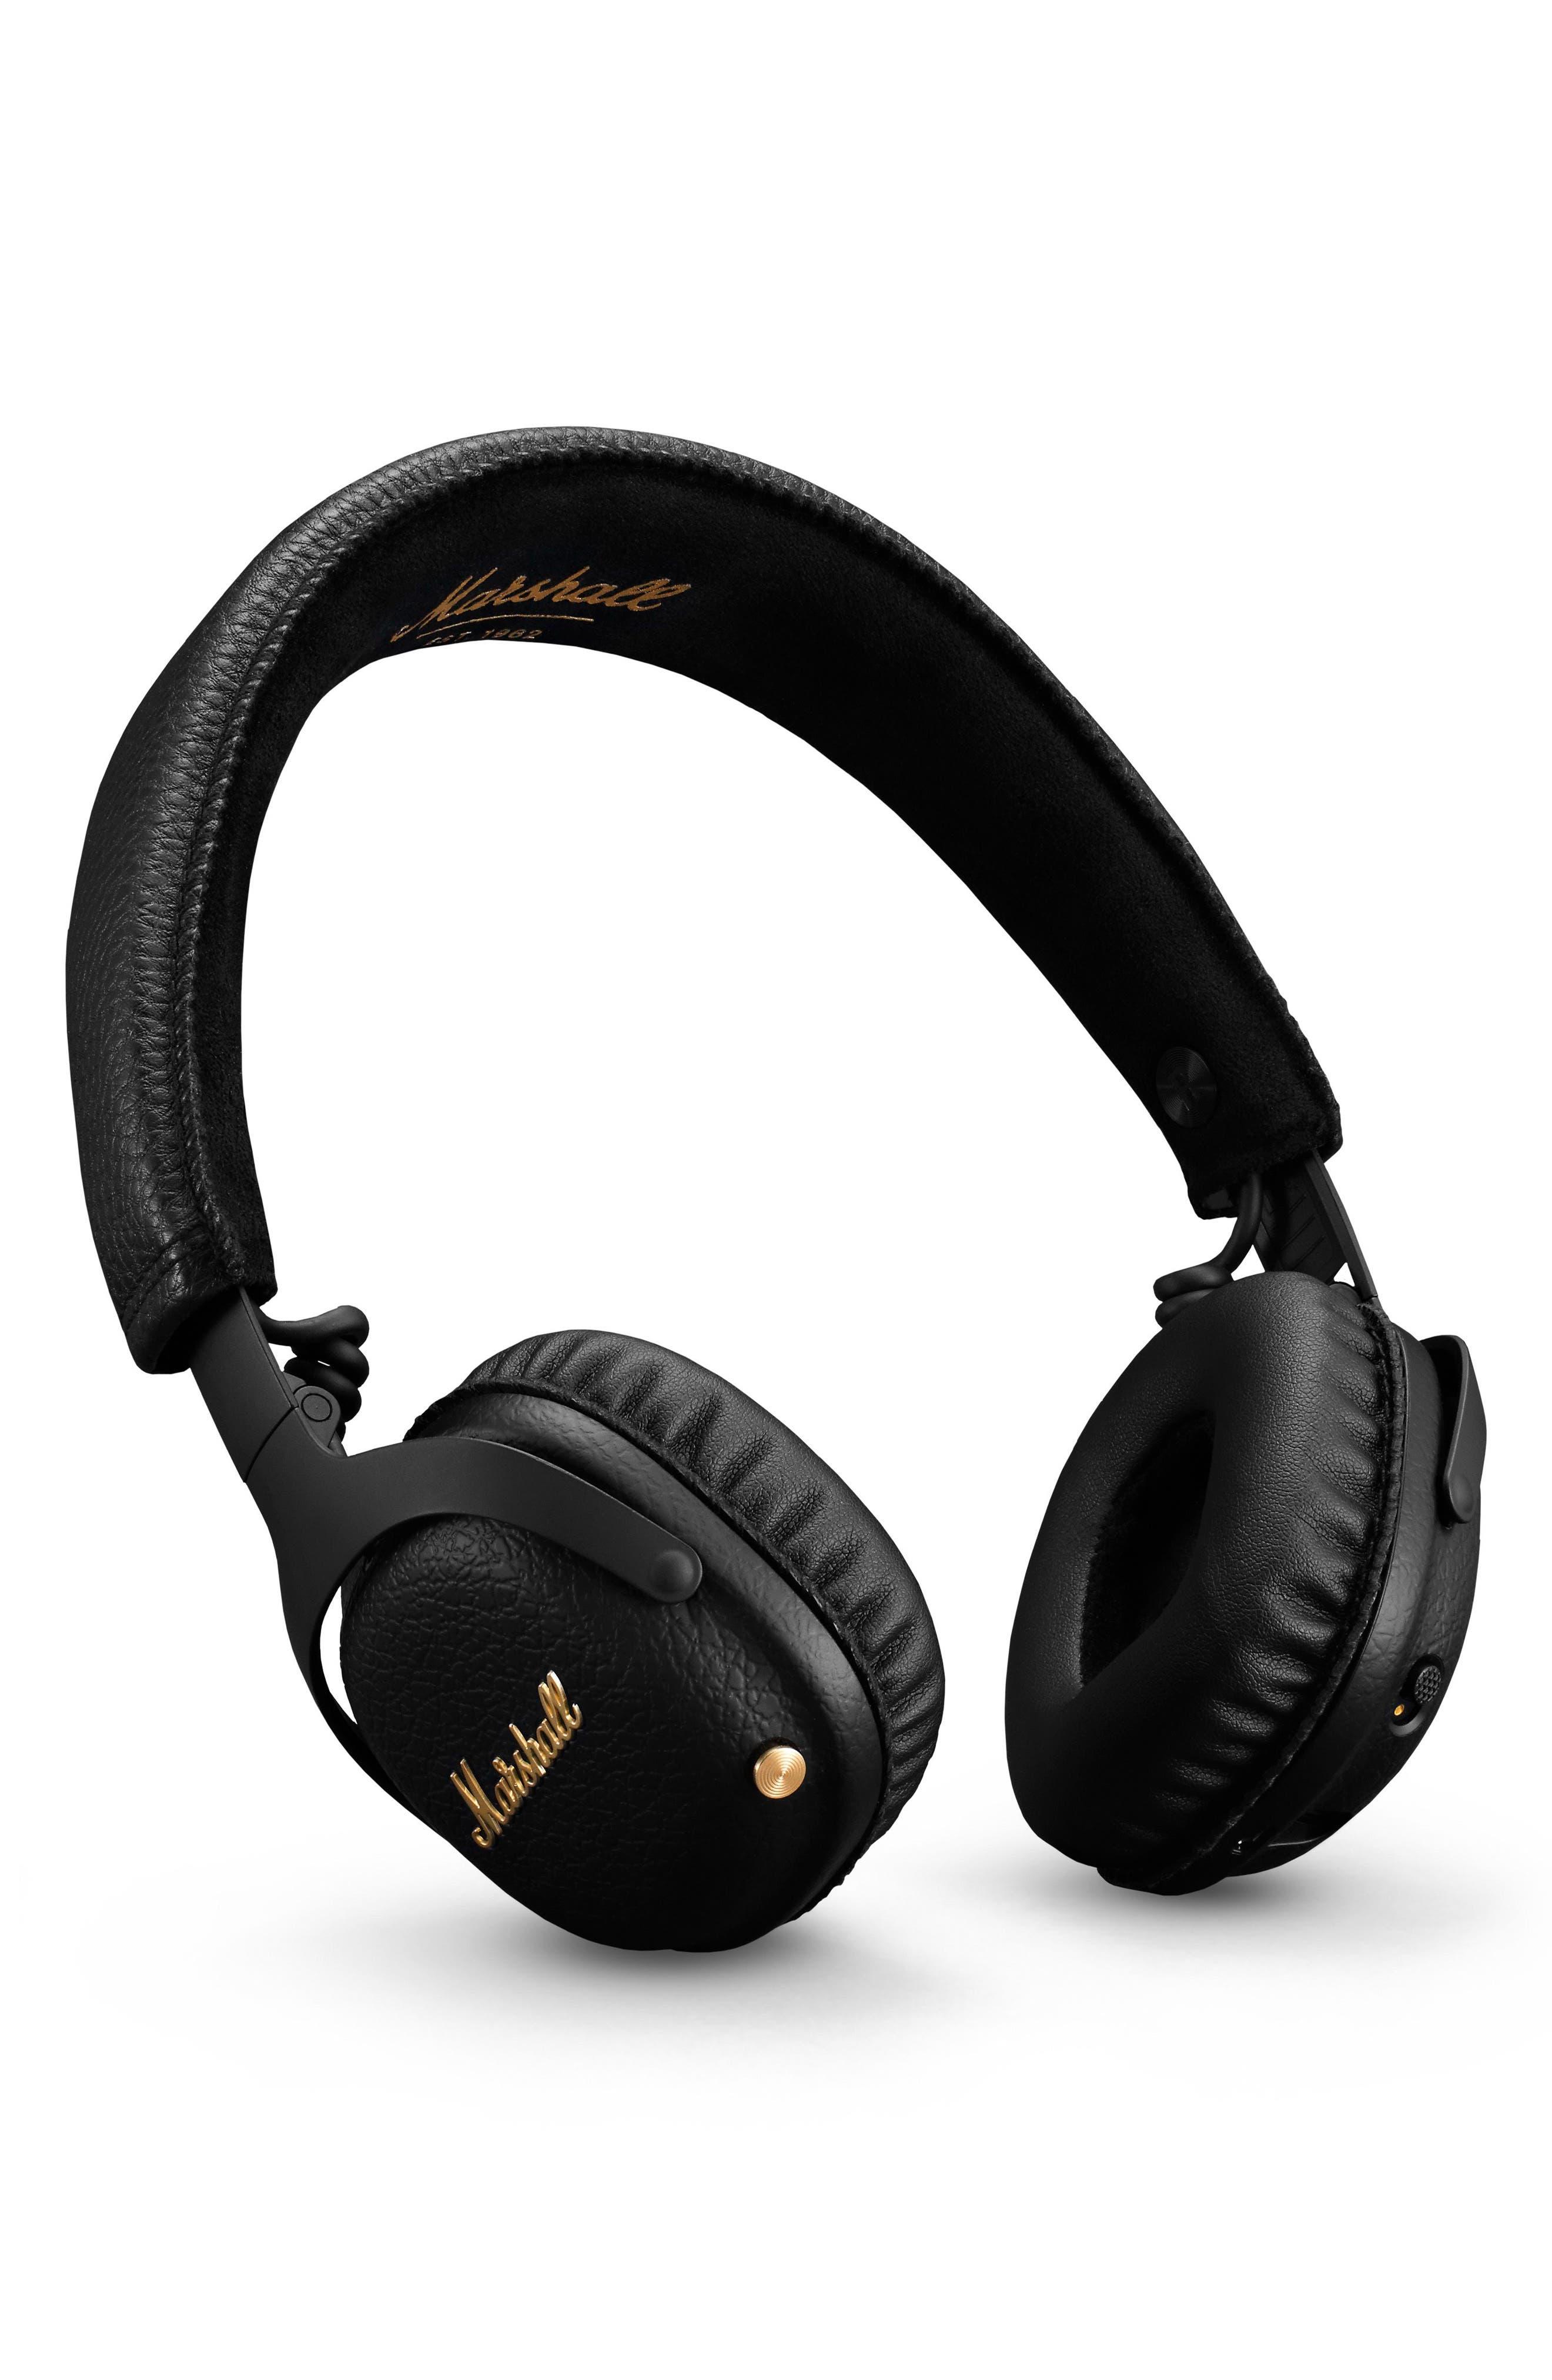 MID ANC Bluetooth<sup>®</sup> On-Ear Headphones,                             Alternate thumbnail 4, color,                             BLACK